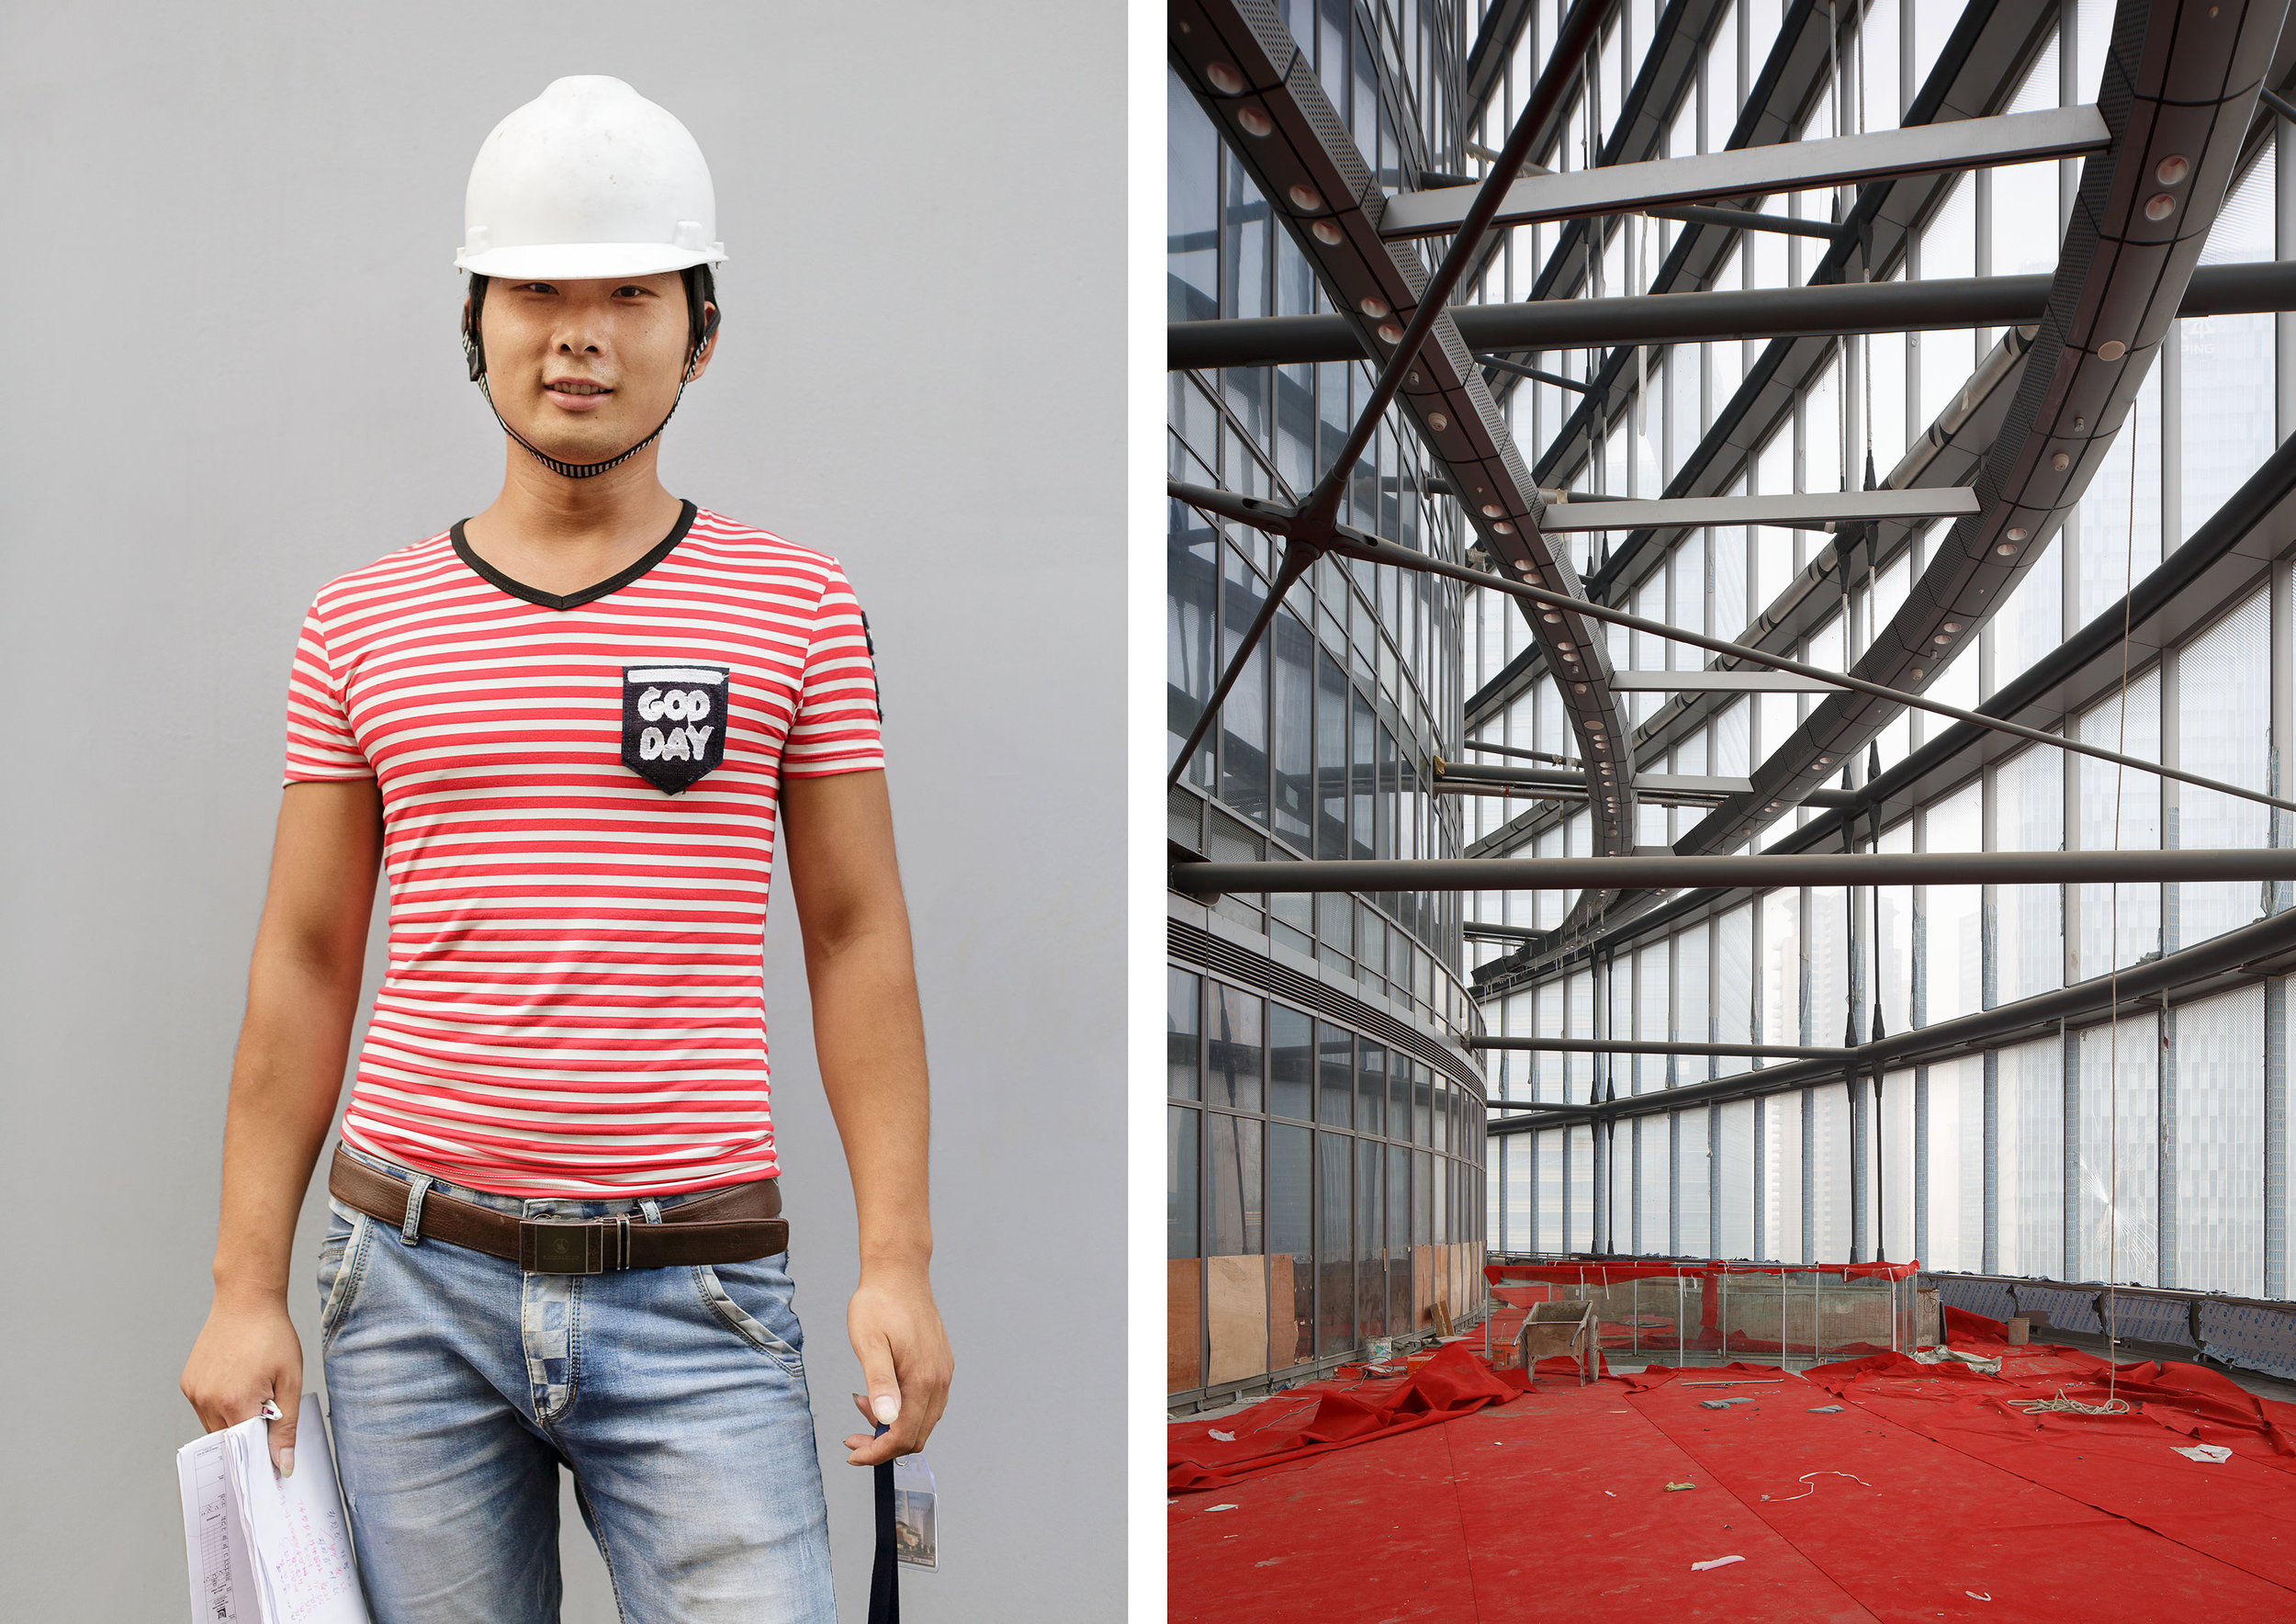 Shanghai_Tower-workers-and-building4.jpg